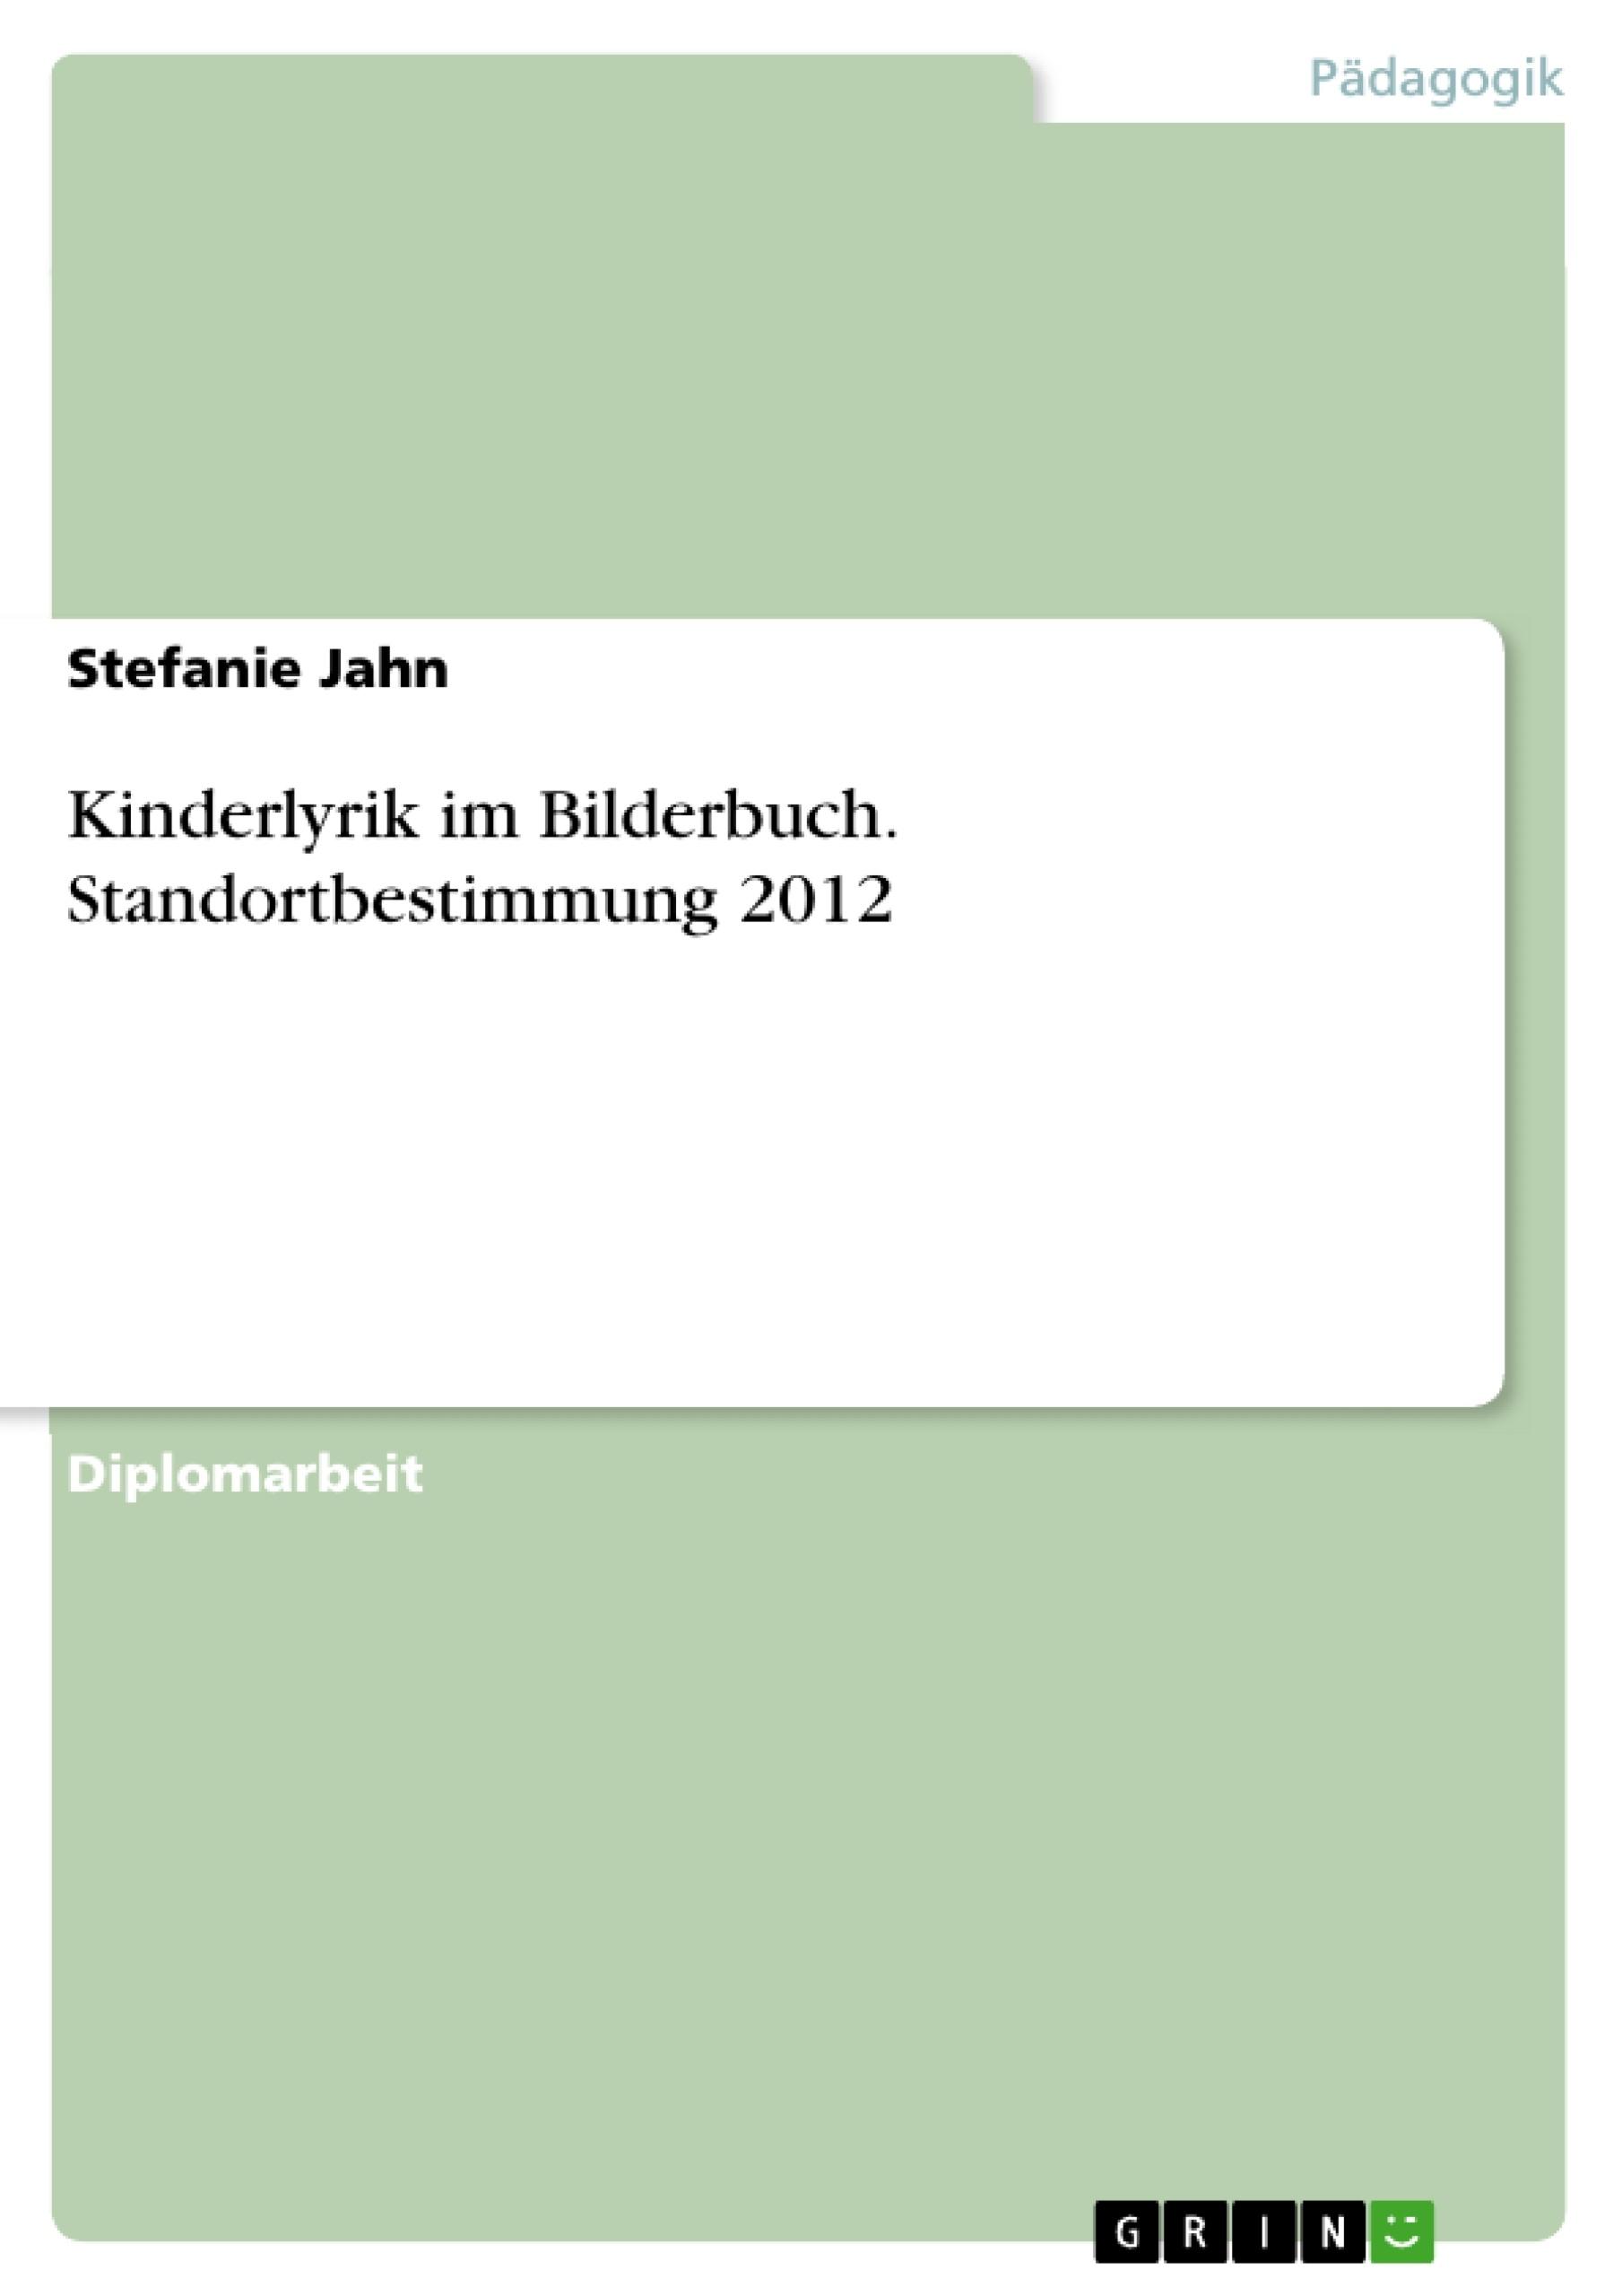 Titel: Kinderlyrik im Bilderbuch. Standortbestimmung 2012